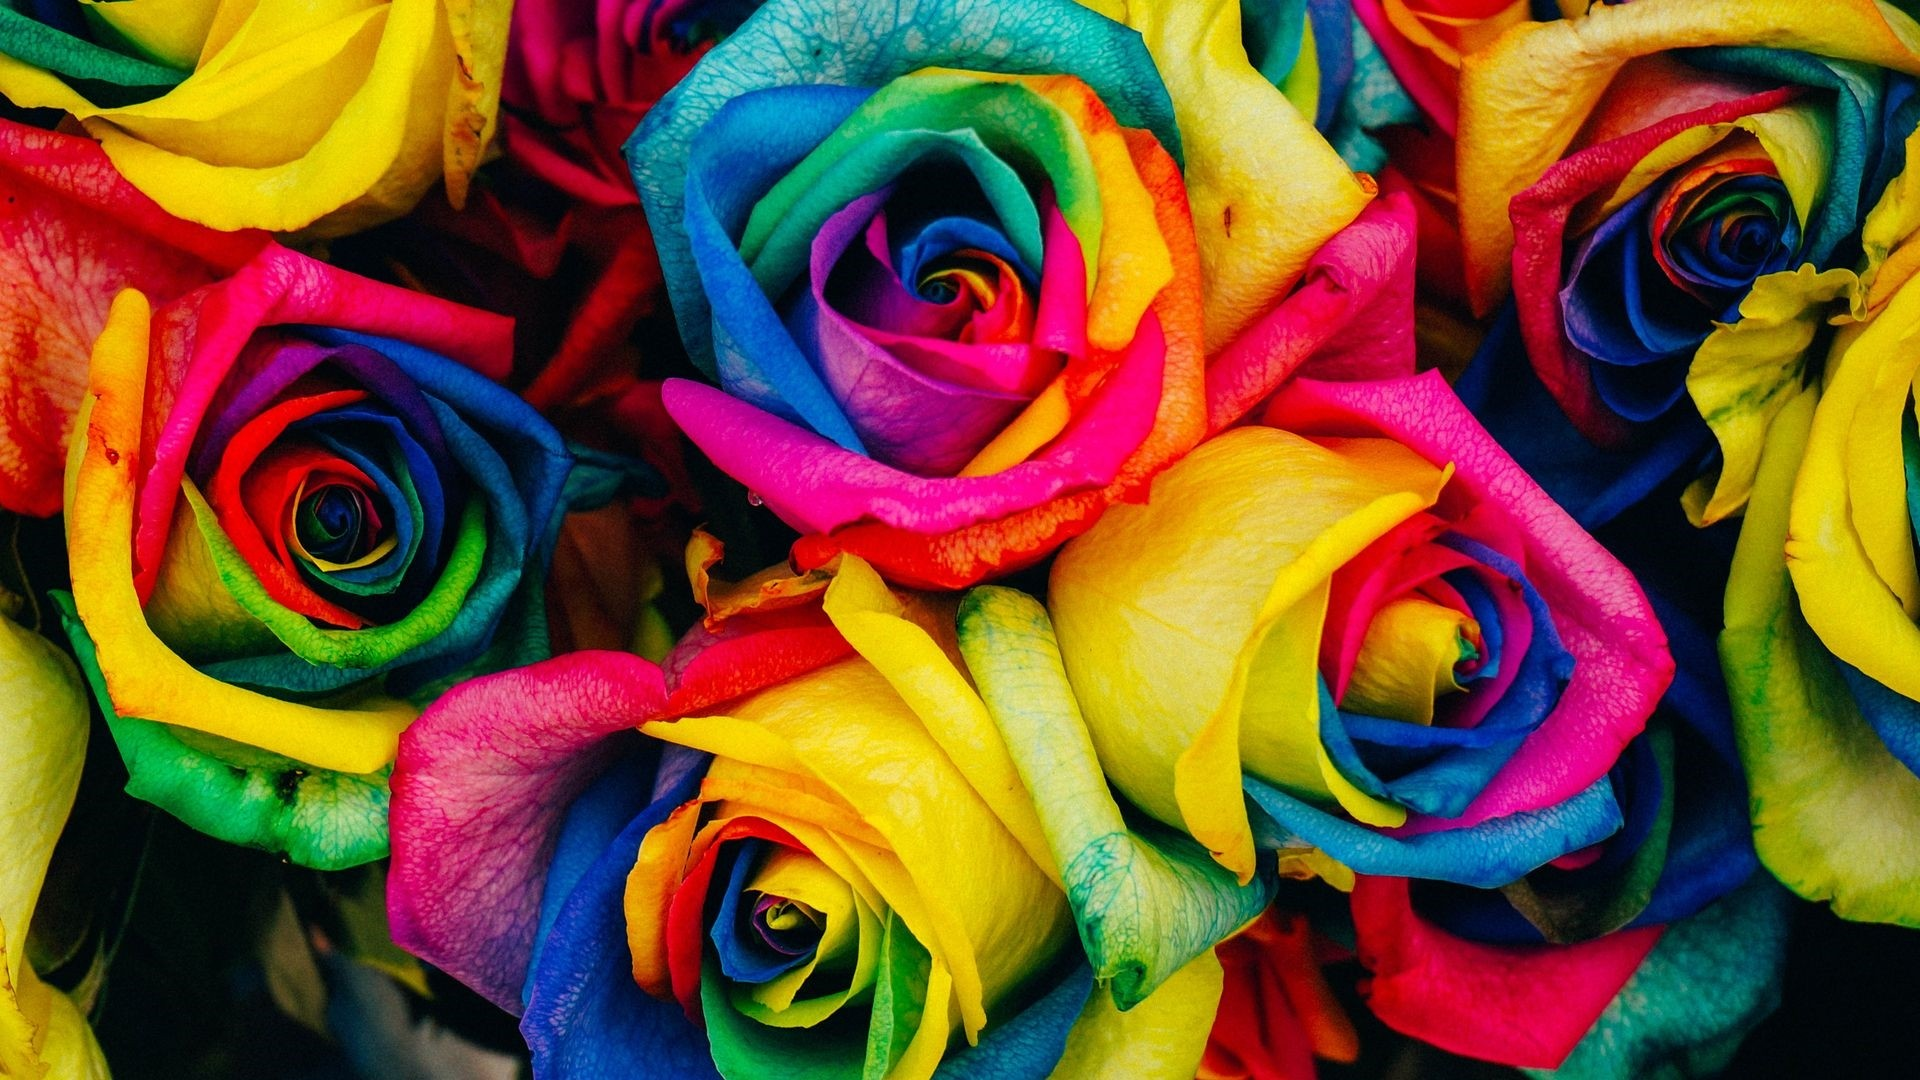 Rainbow Rose hd wallpaper download